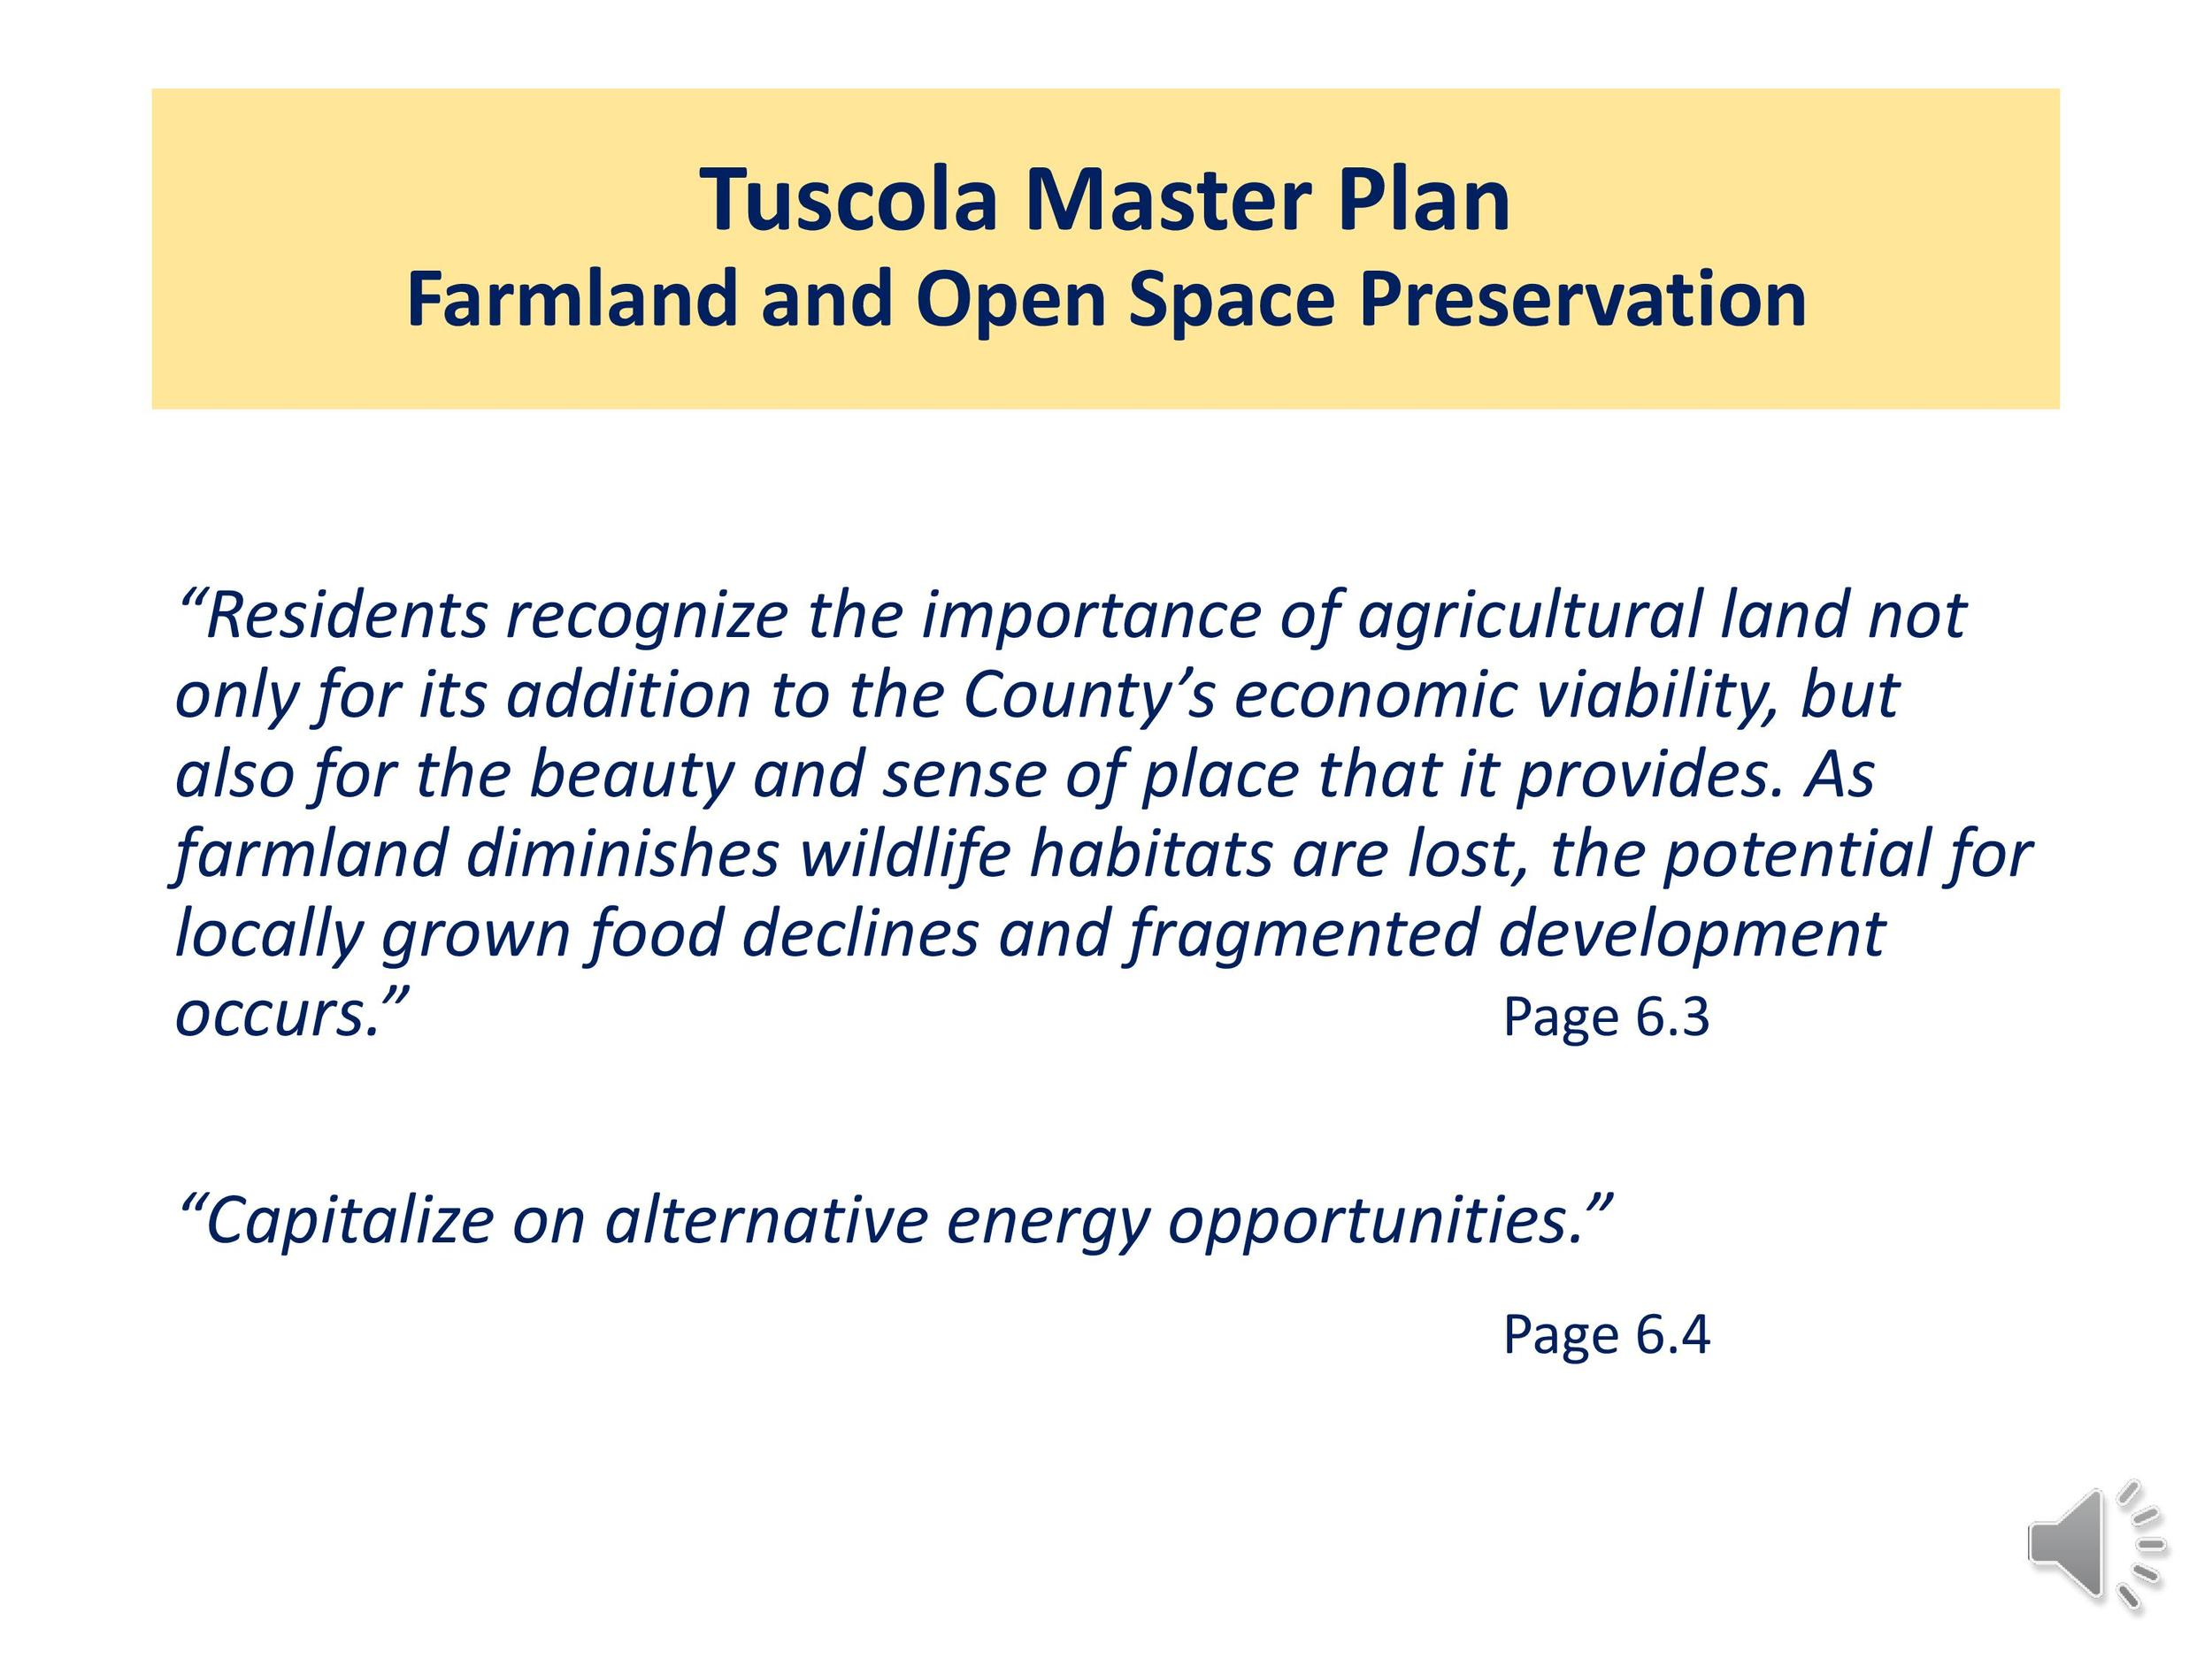 Wind Energy in Tuscola-page-043.jpg